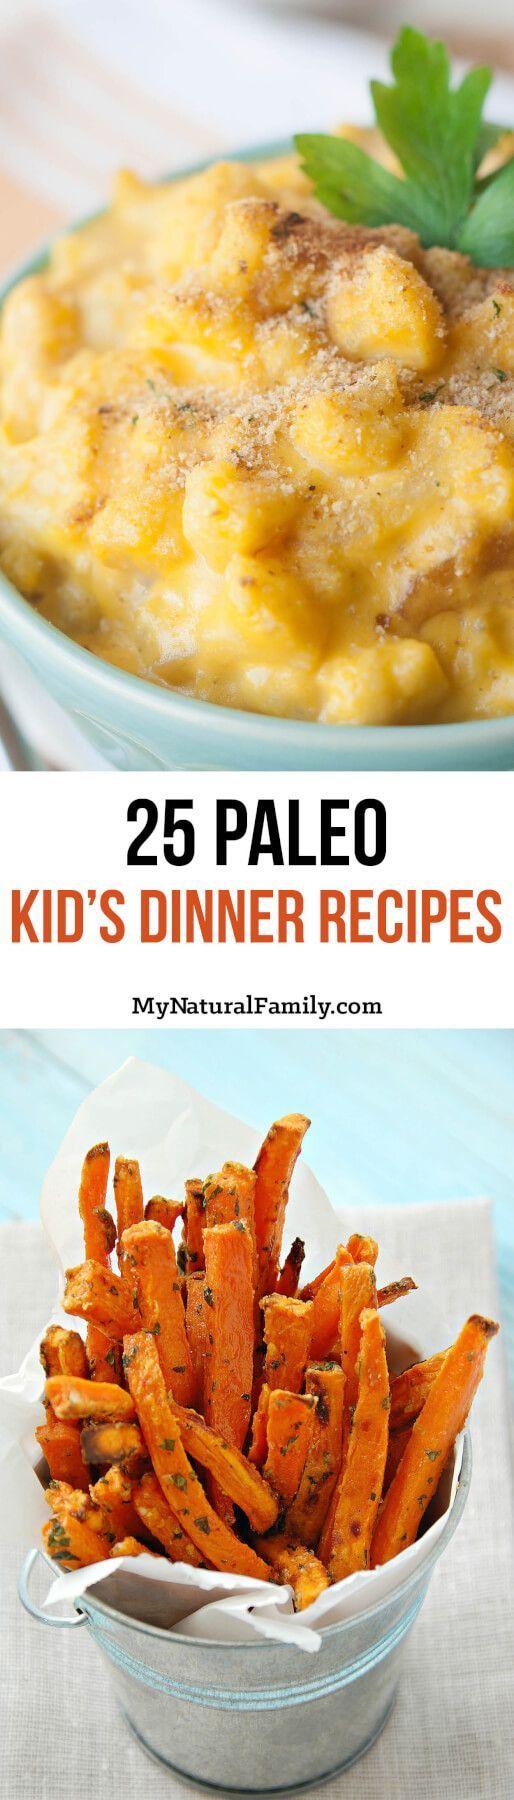 25 Paleo Kids Dinner Recipes